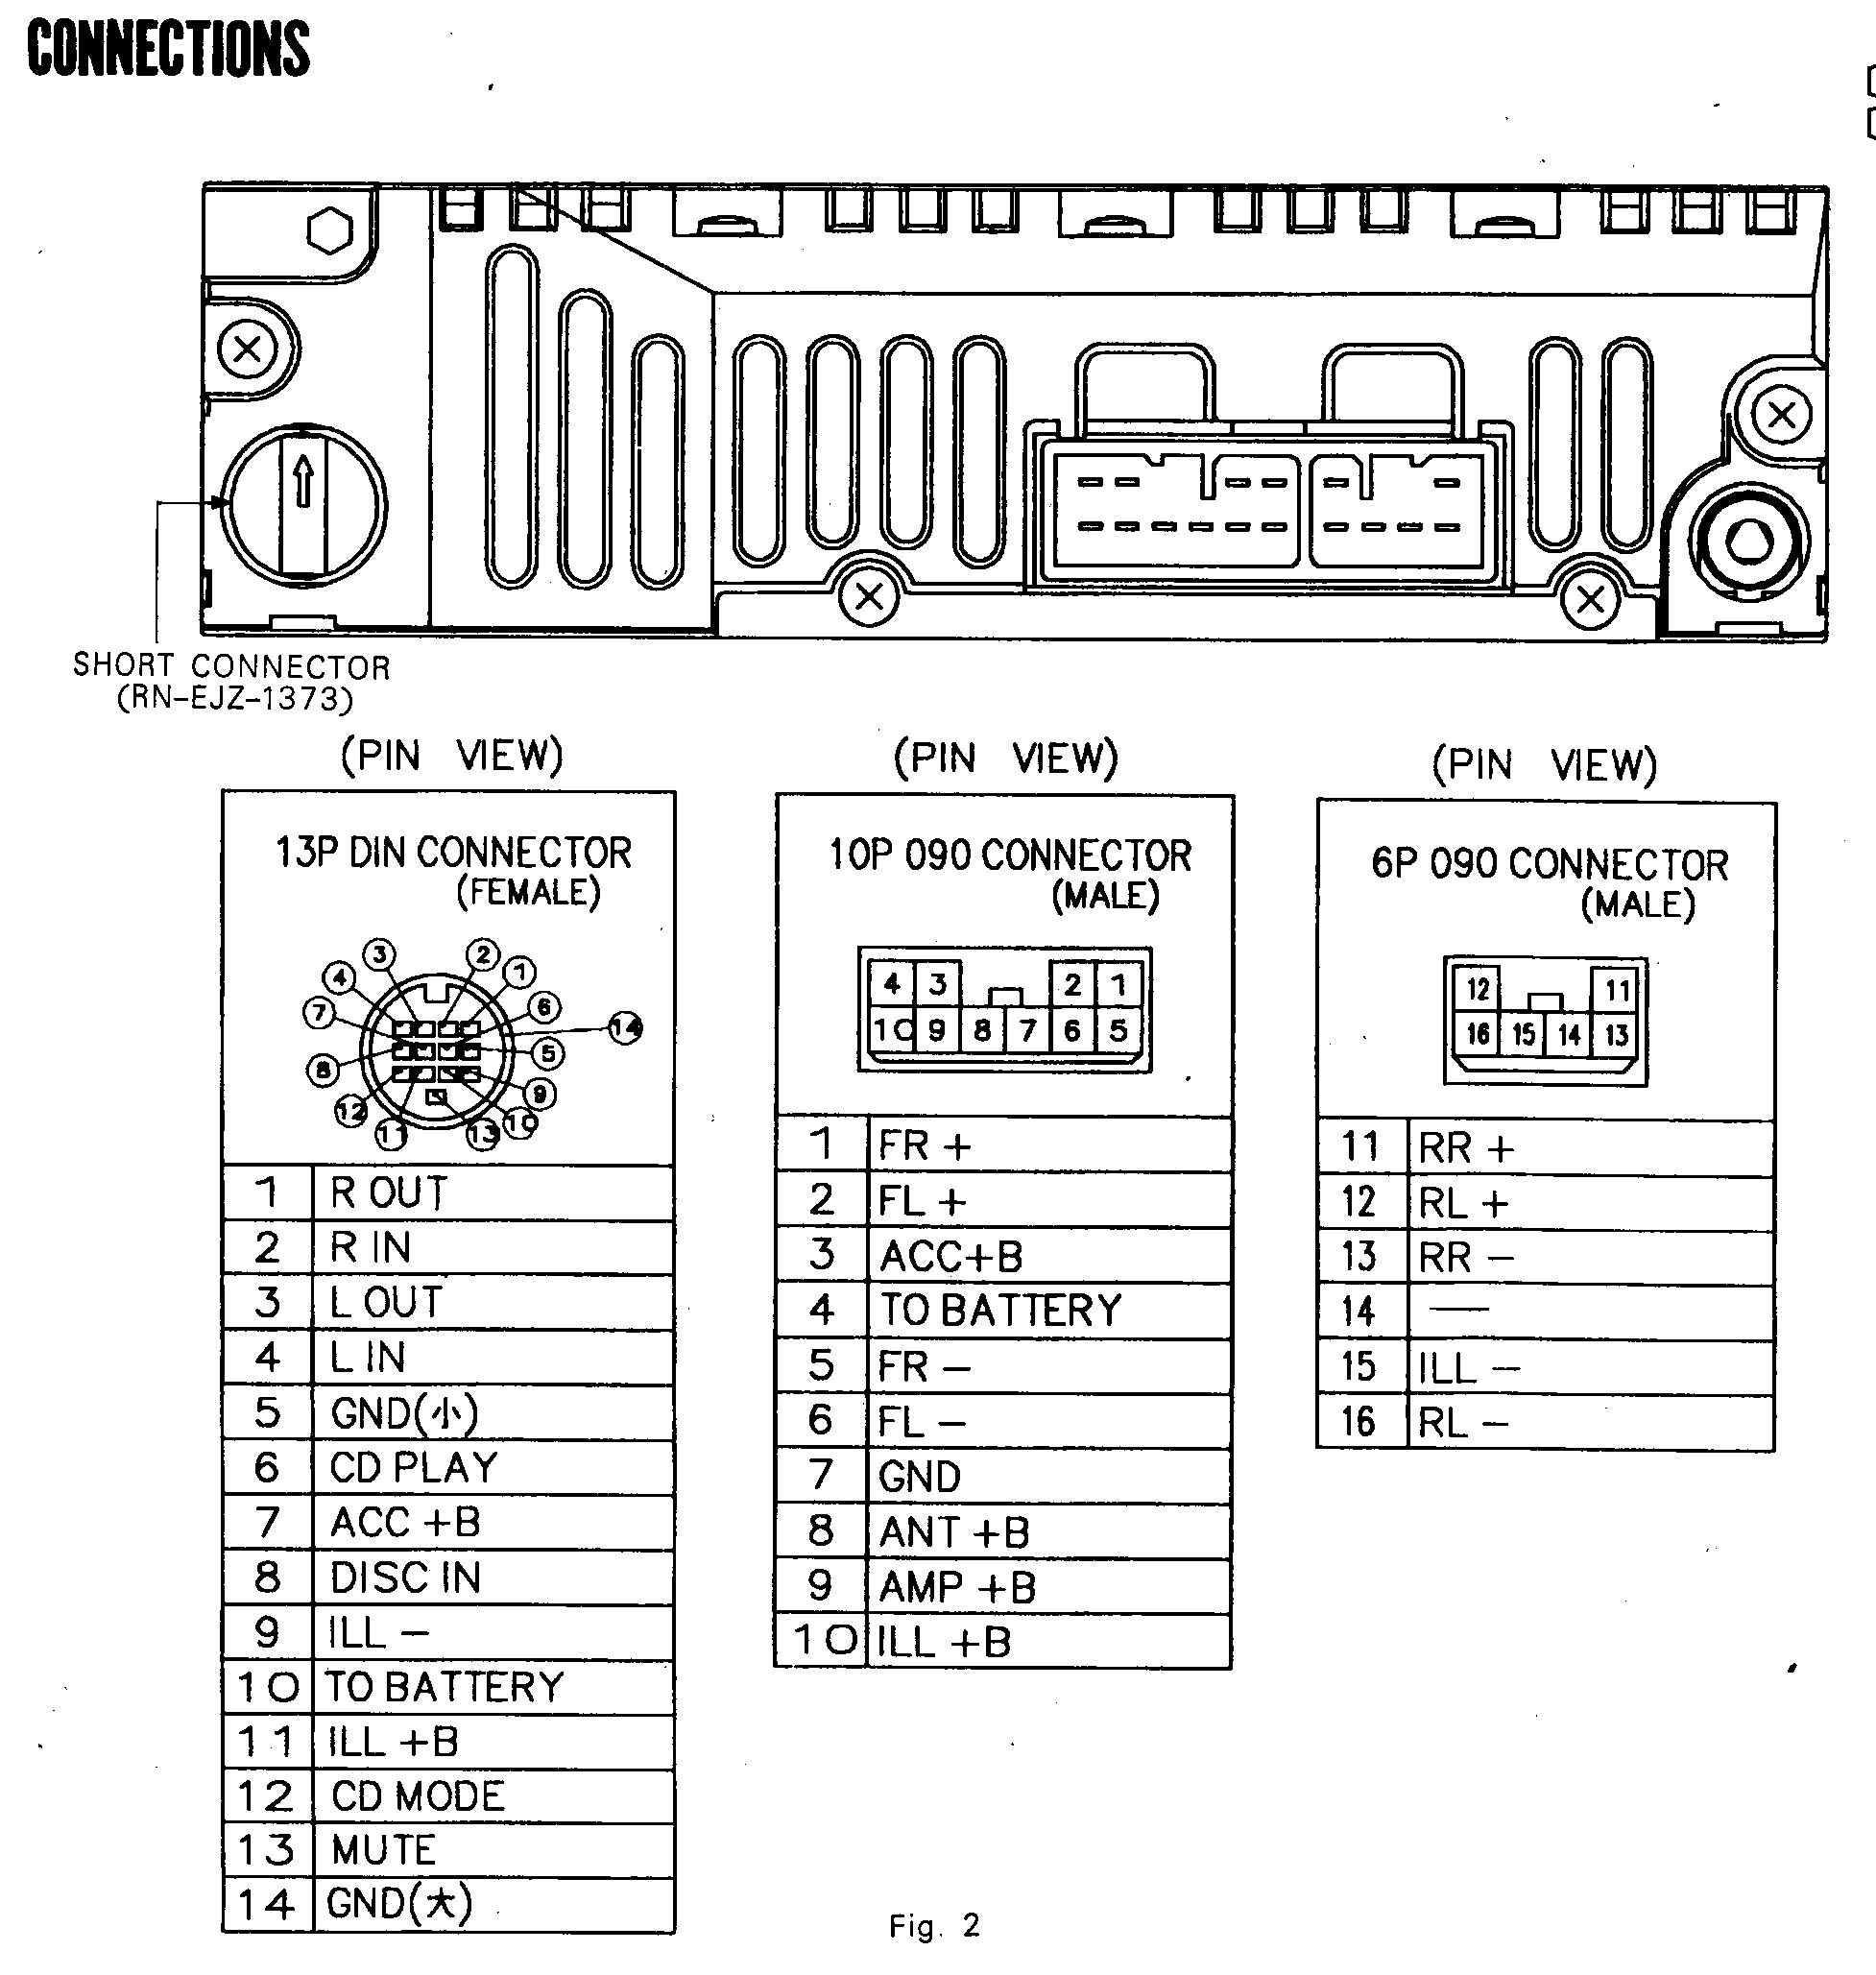 Wiring Diagram For 2000 Pontiac Bonneville - Wire Diagram